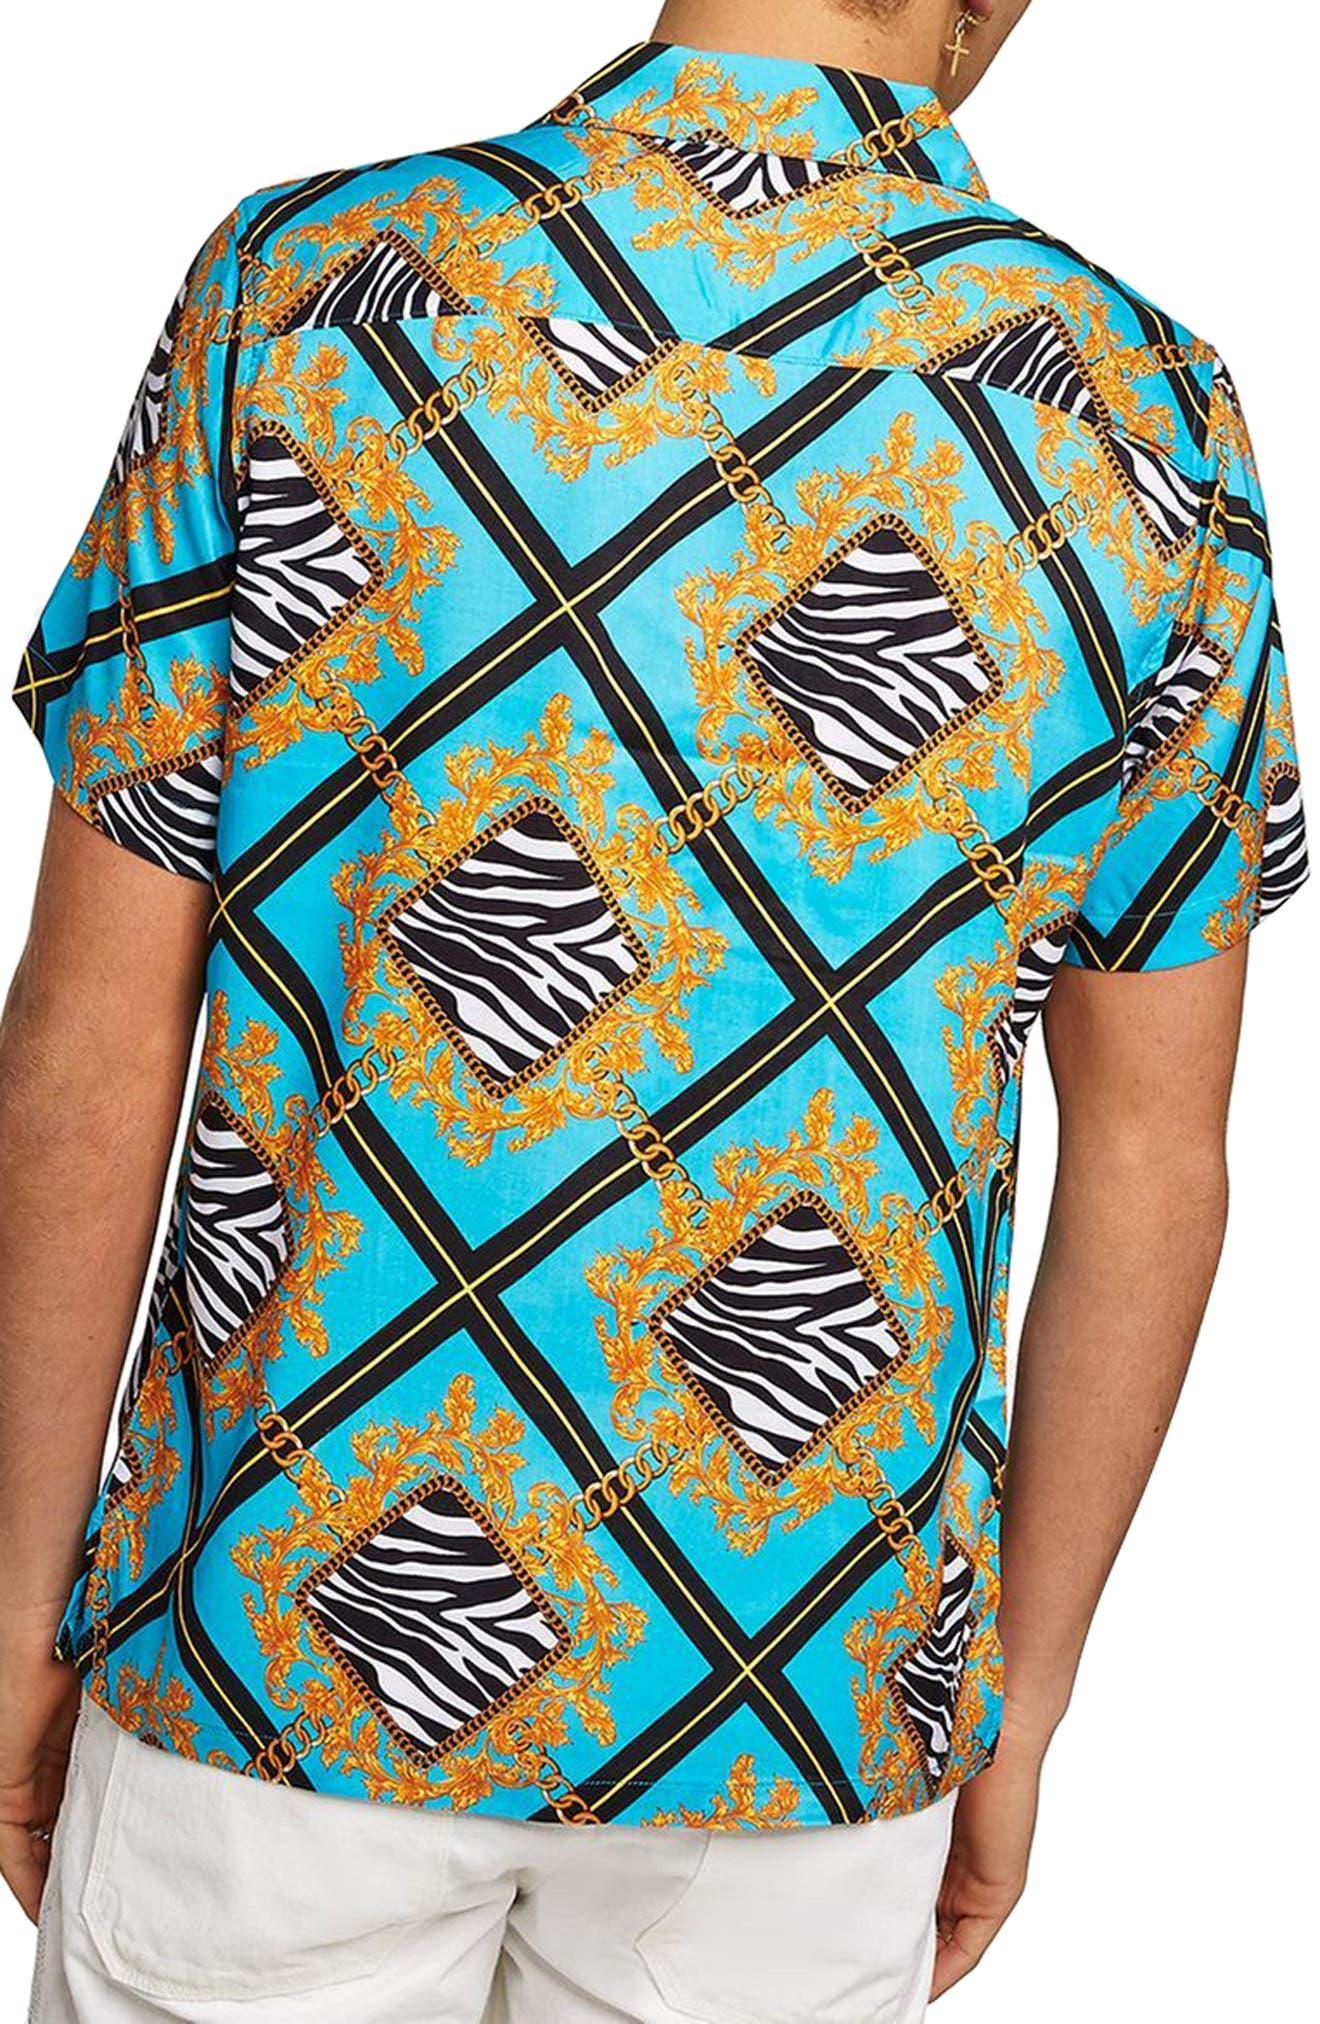 Baroque Zebra Print Shirt,                             Alternate thumbnail 3, color,                             Blue